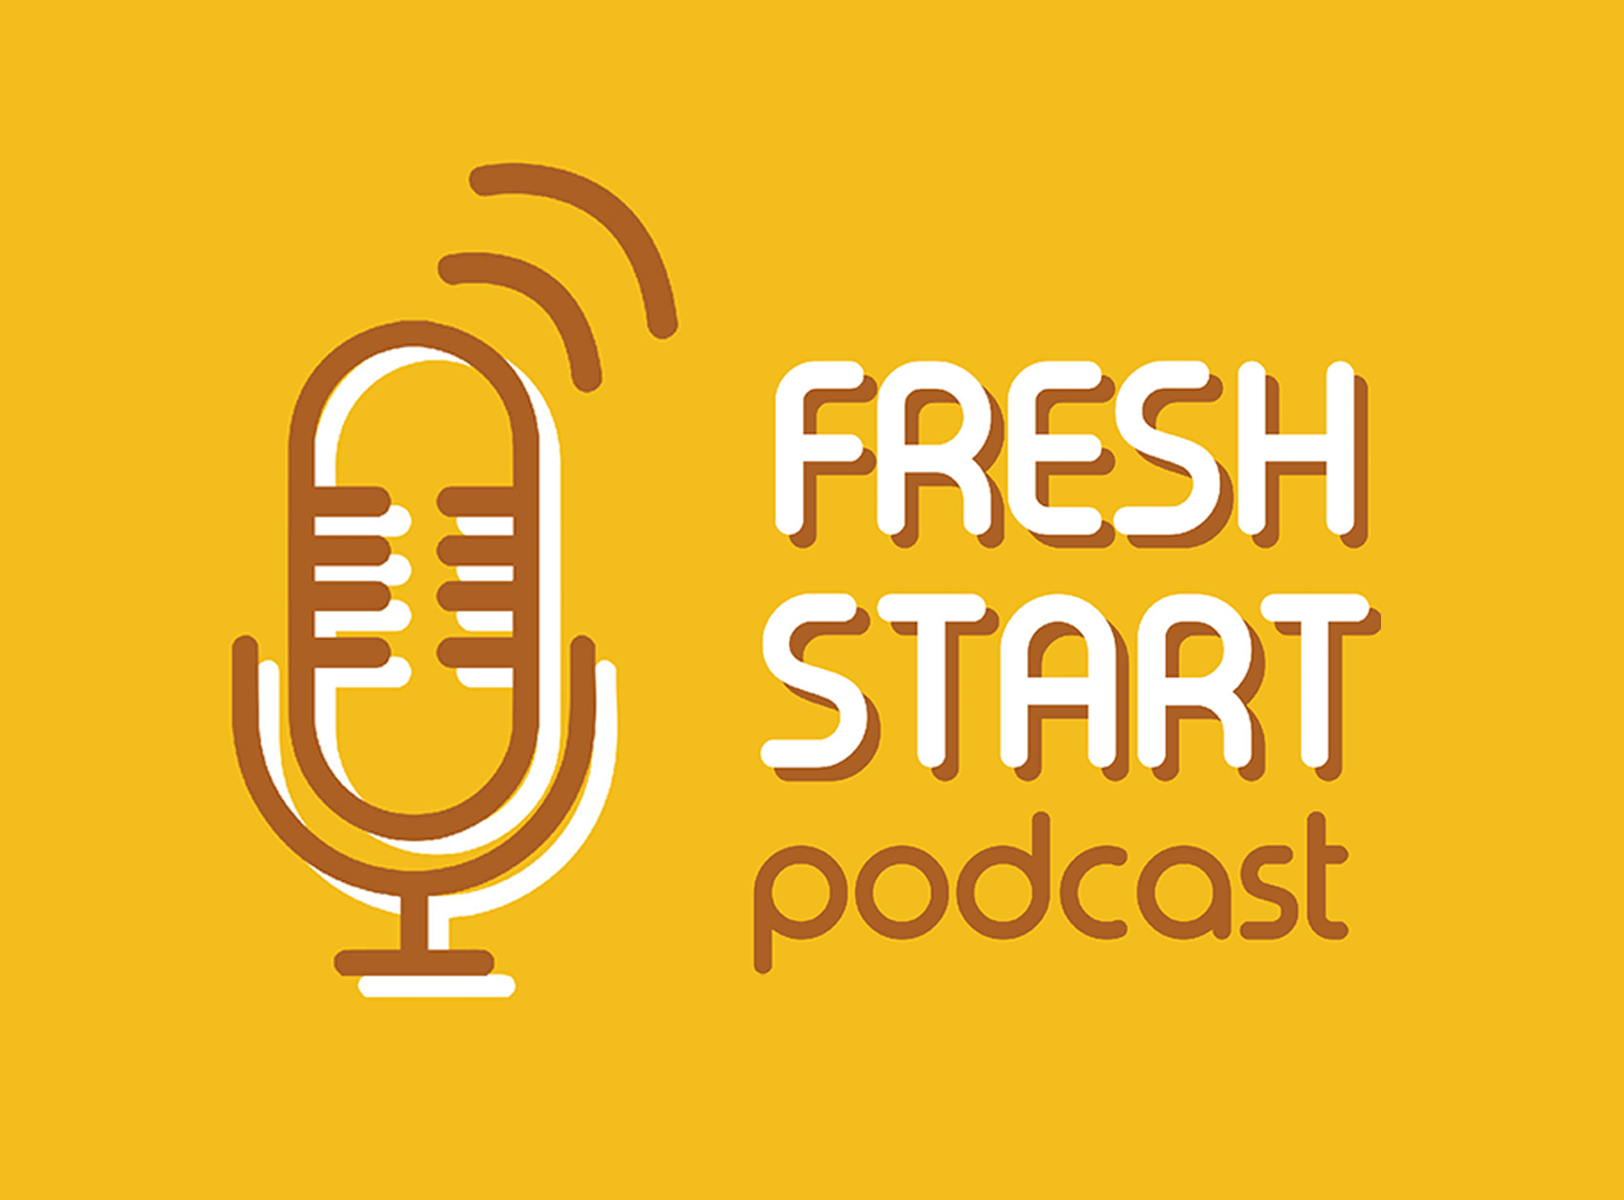 Fresh Start: Podcast News (12/26/2018 Wed.)